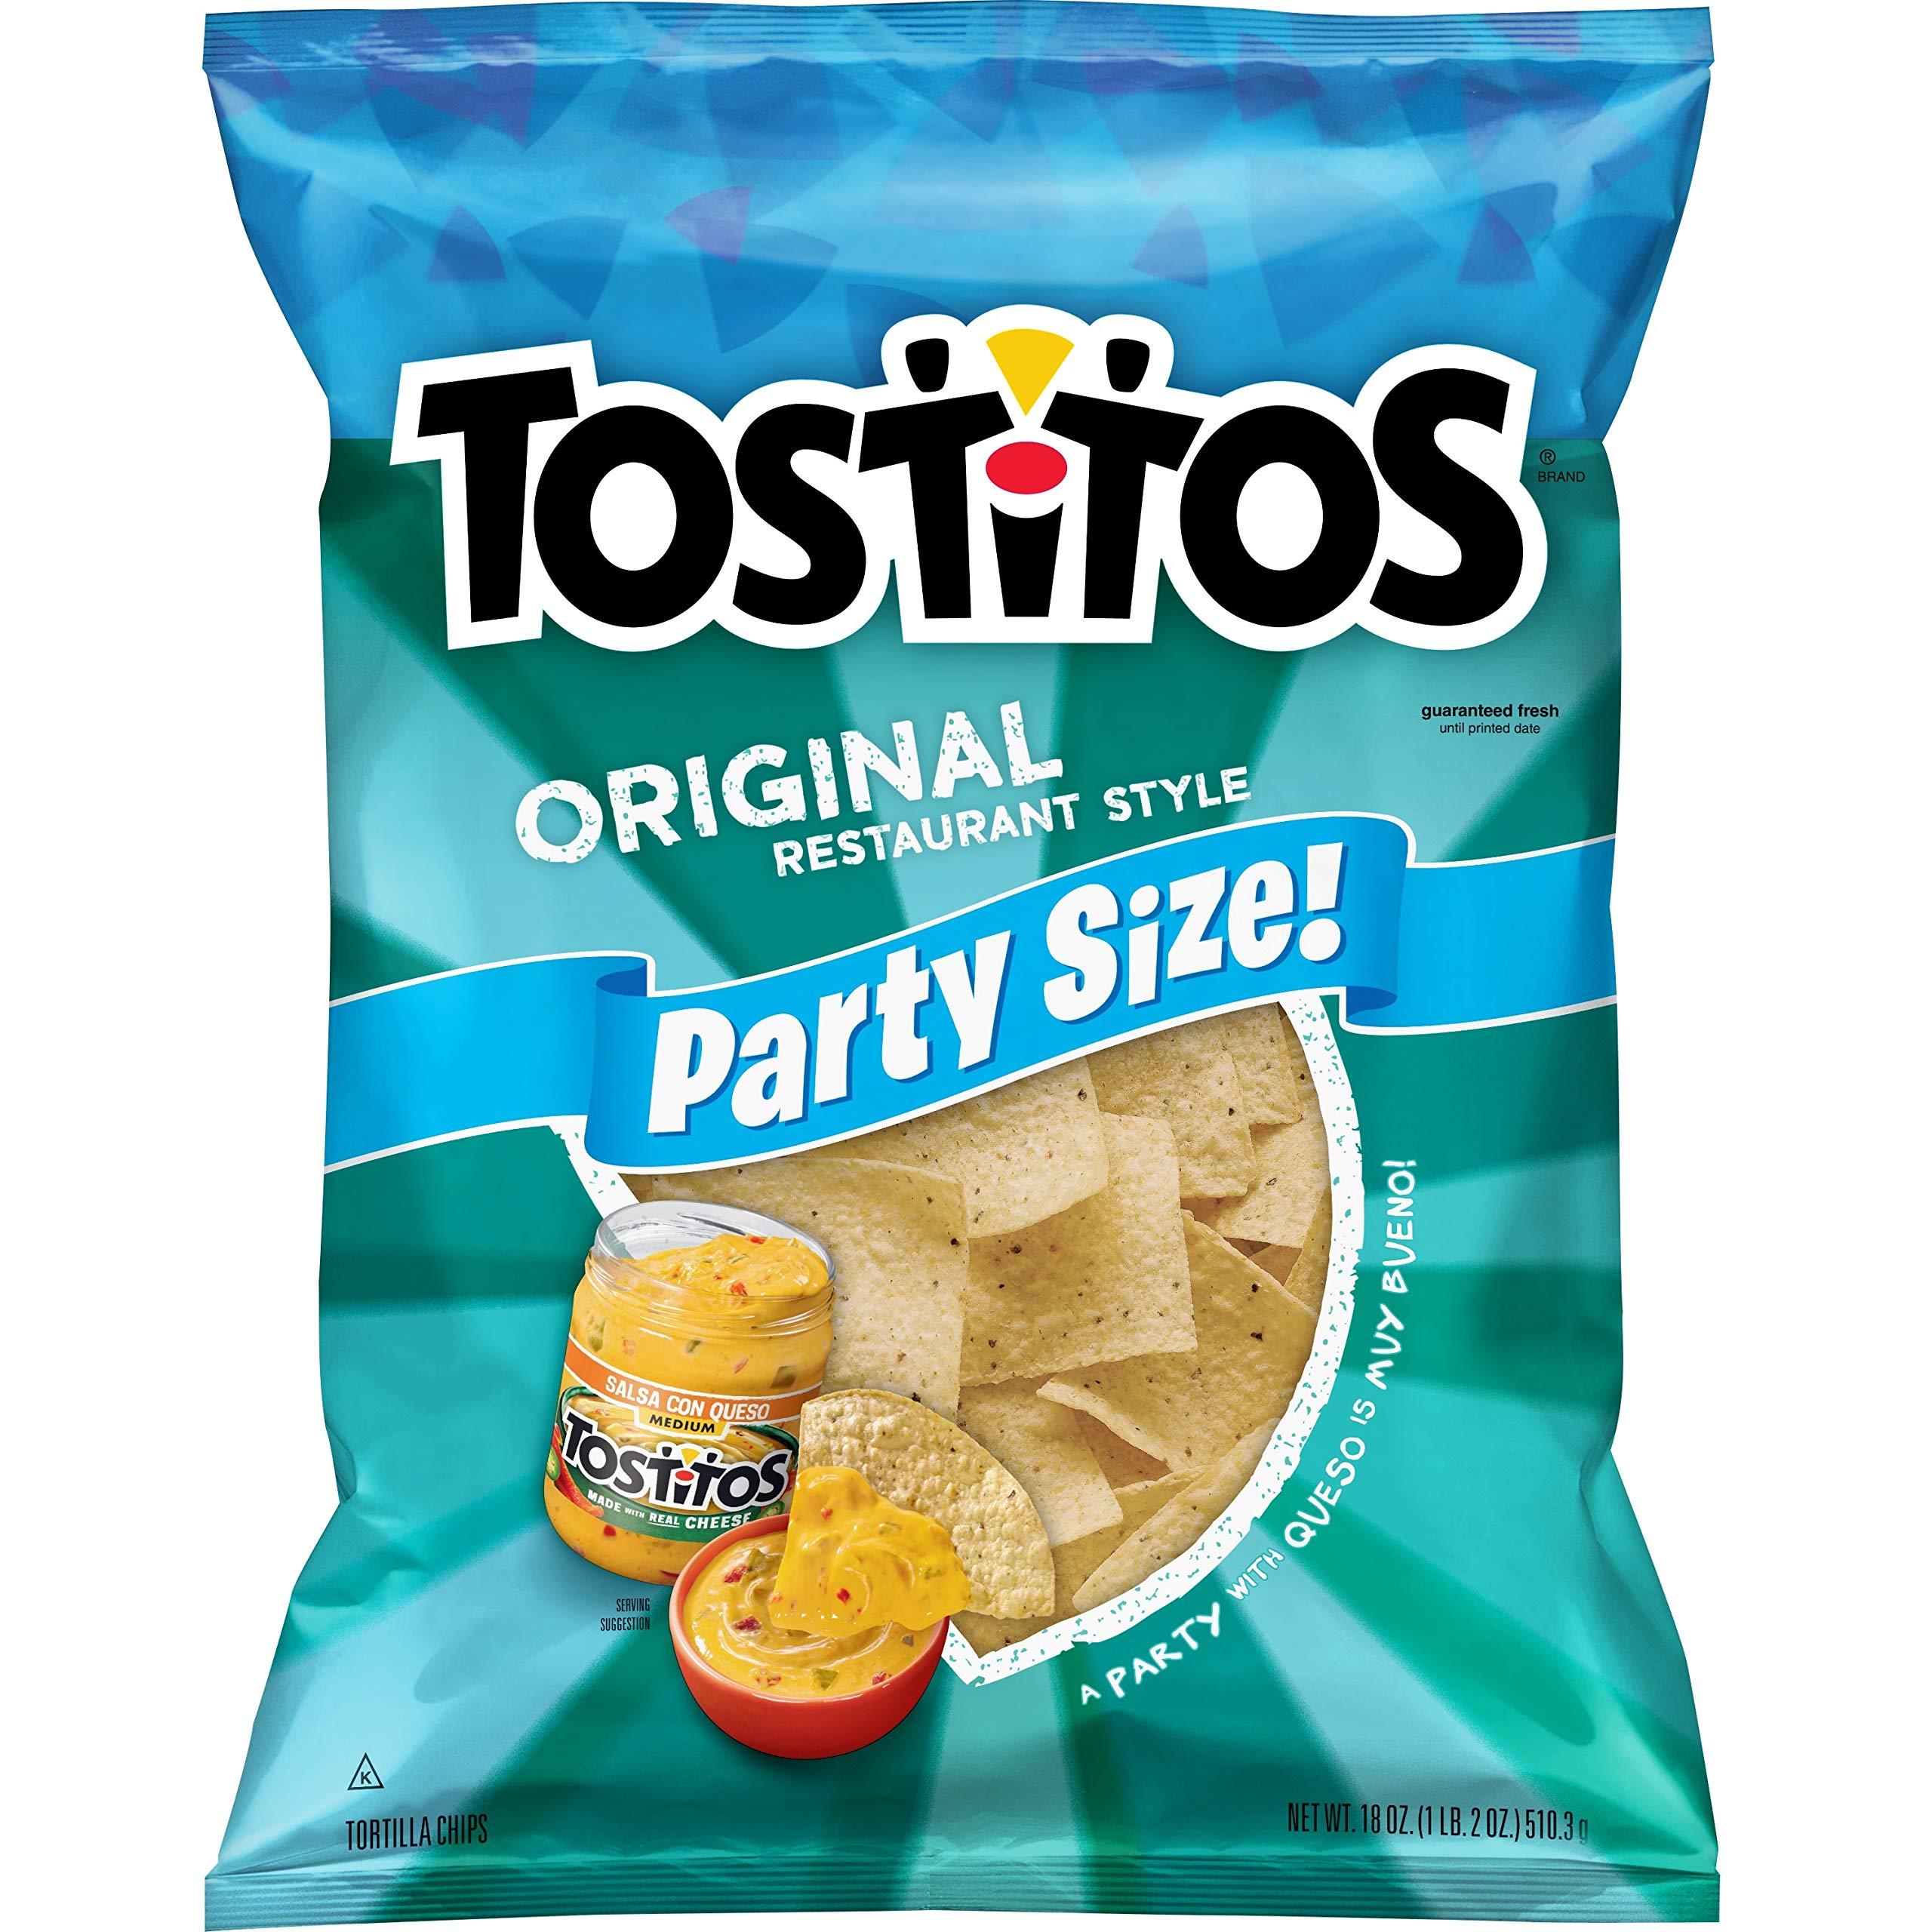 Tostitos Original Restaurant Style Tortilla Chips, Party Size, 18 oz Bag - 3 pack